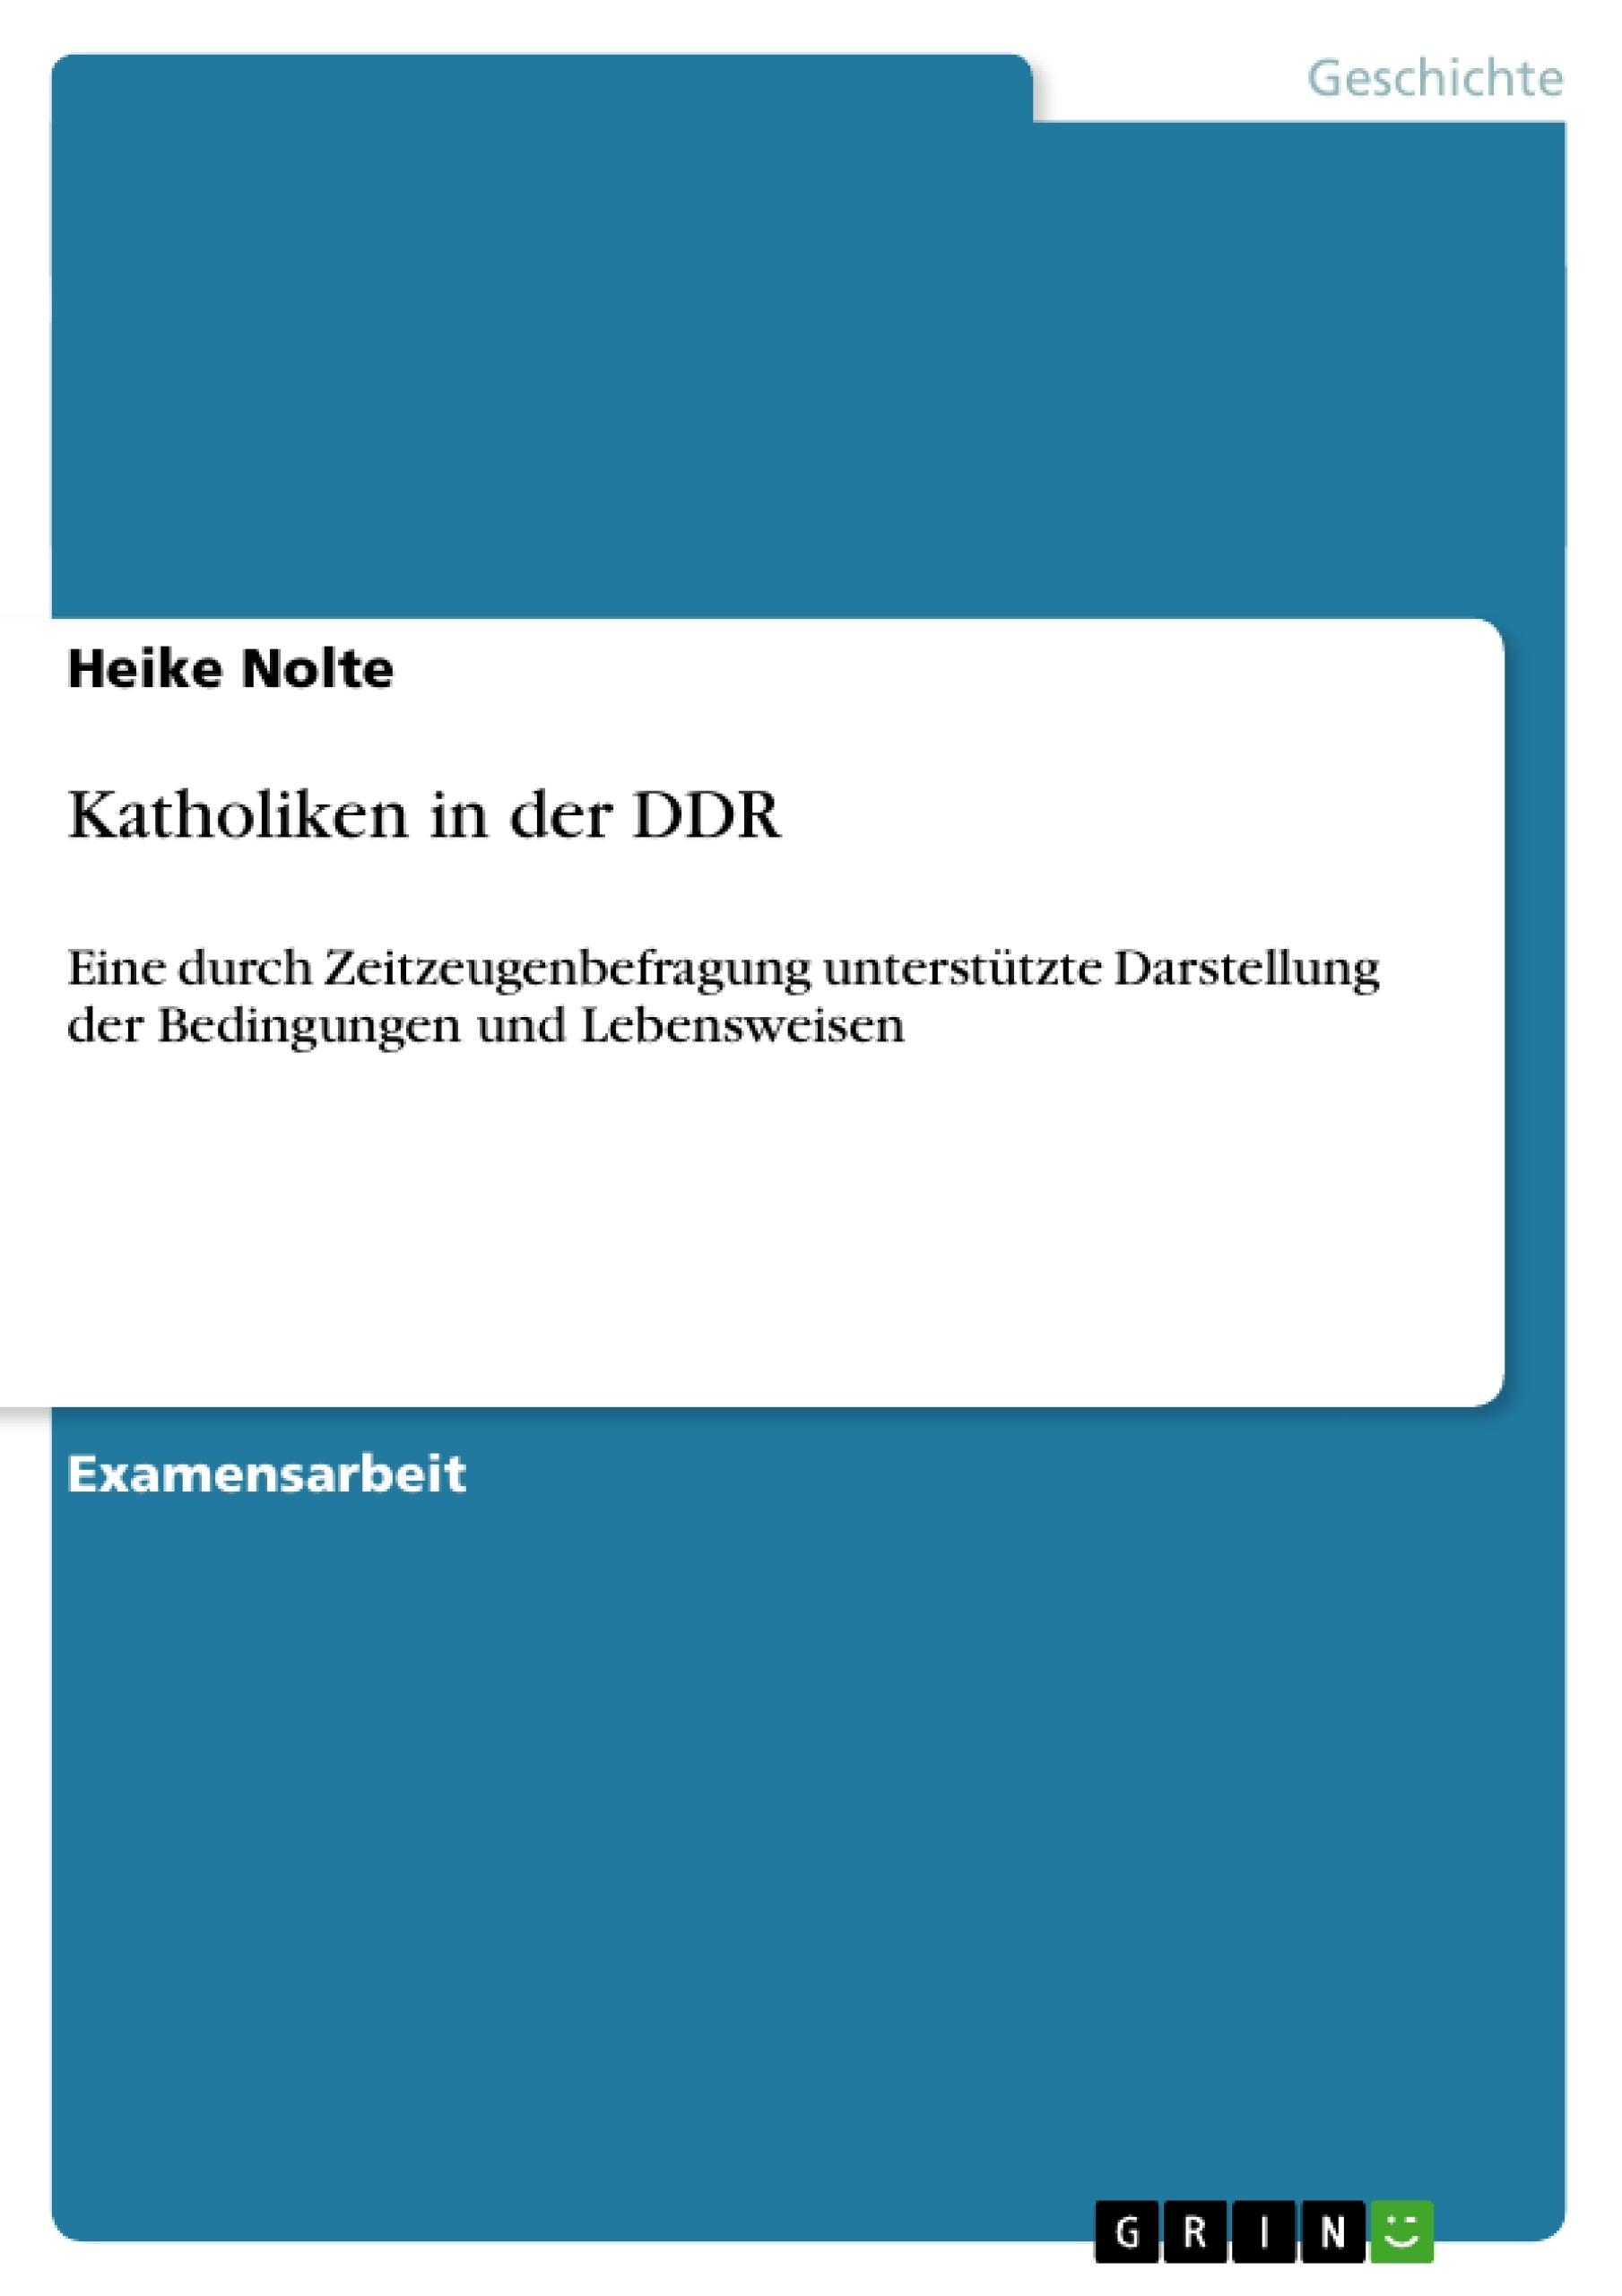 Titel: Katholiken in der DDR